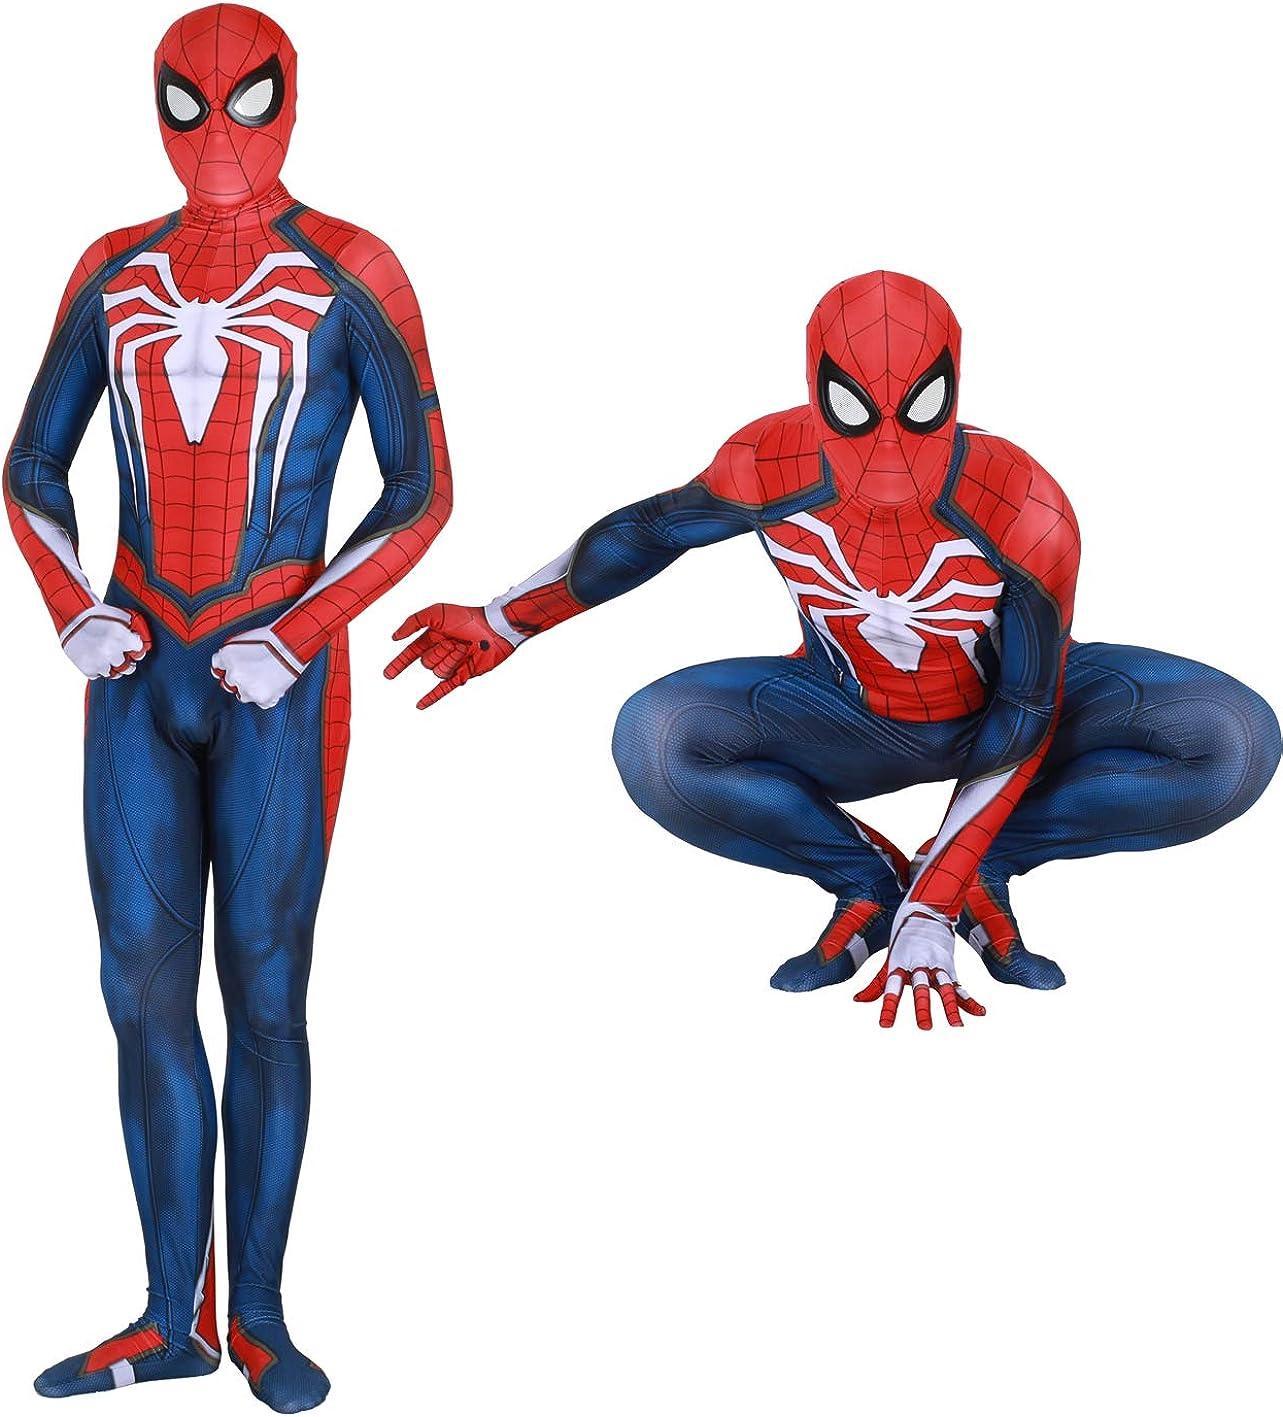 YuanMan Spider Man PS4 Insomniac Spiderman Costume 3D Print Spandex Halloween Zentai Suit Adult//Kids